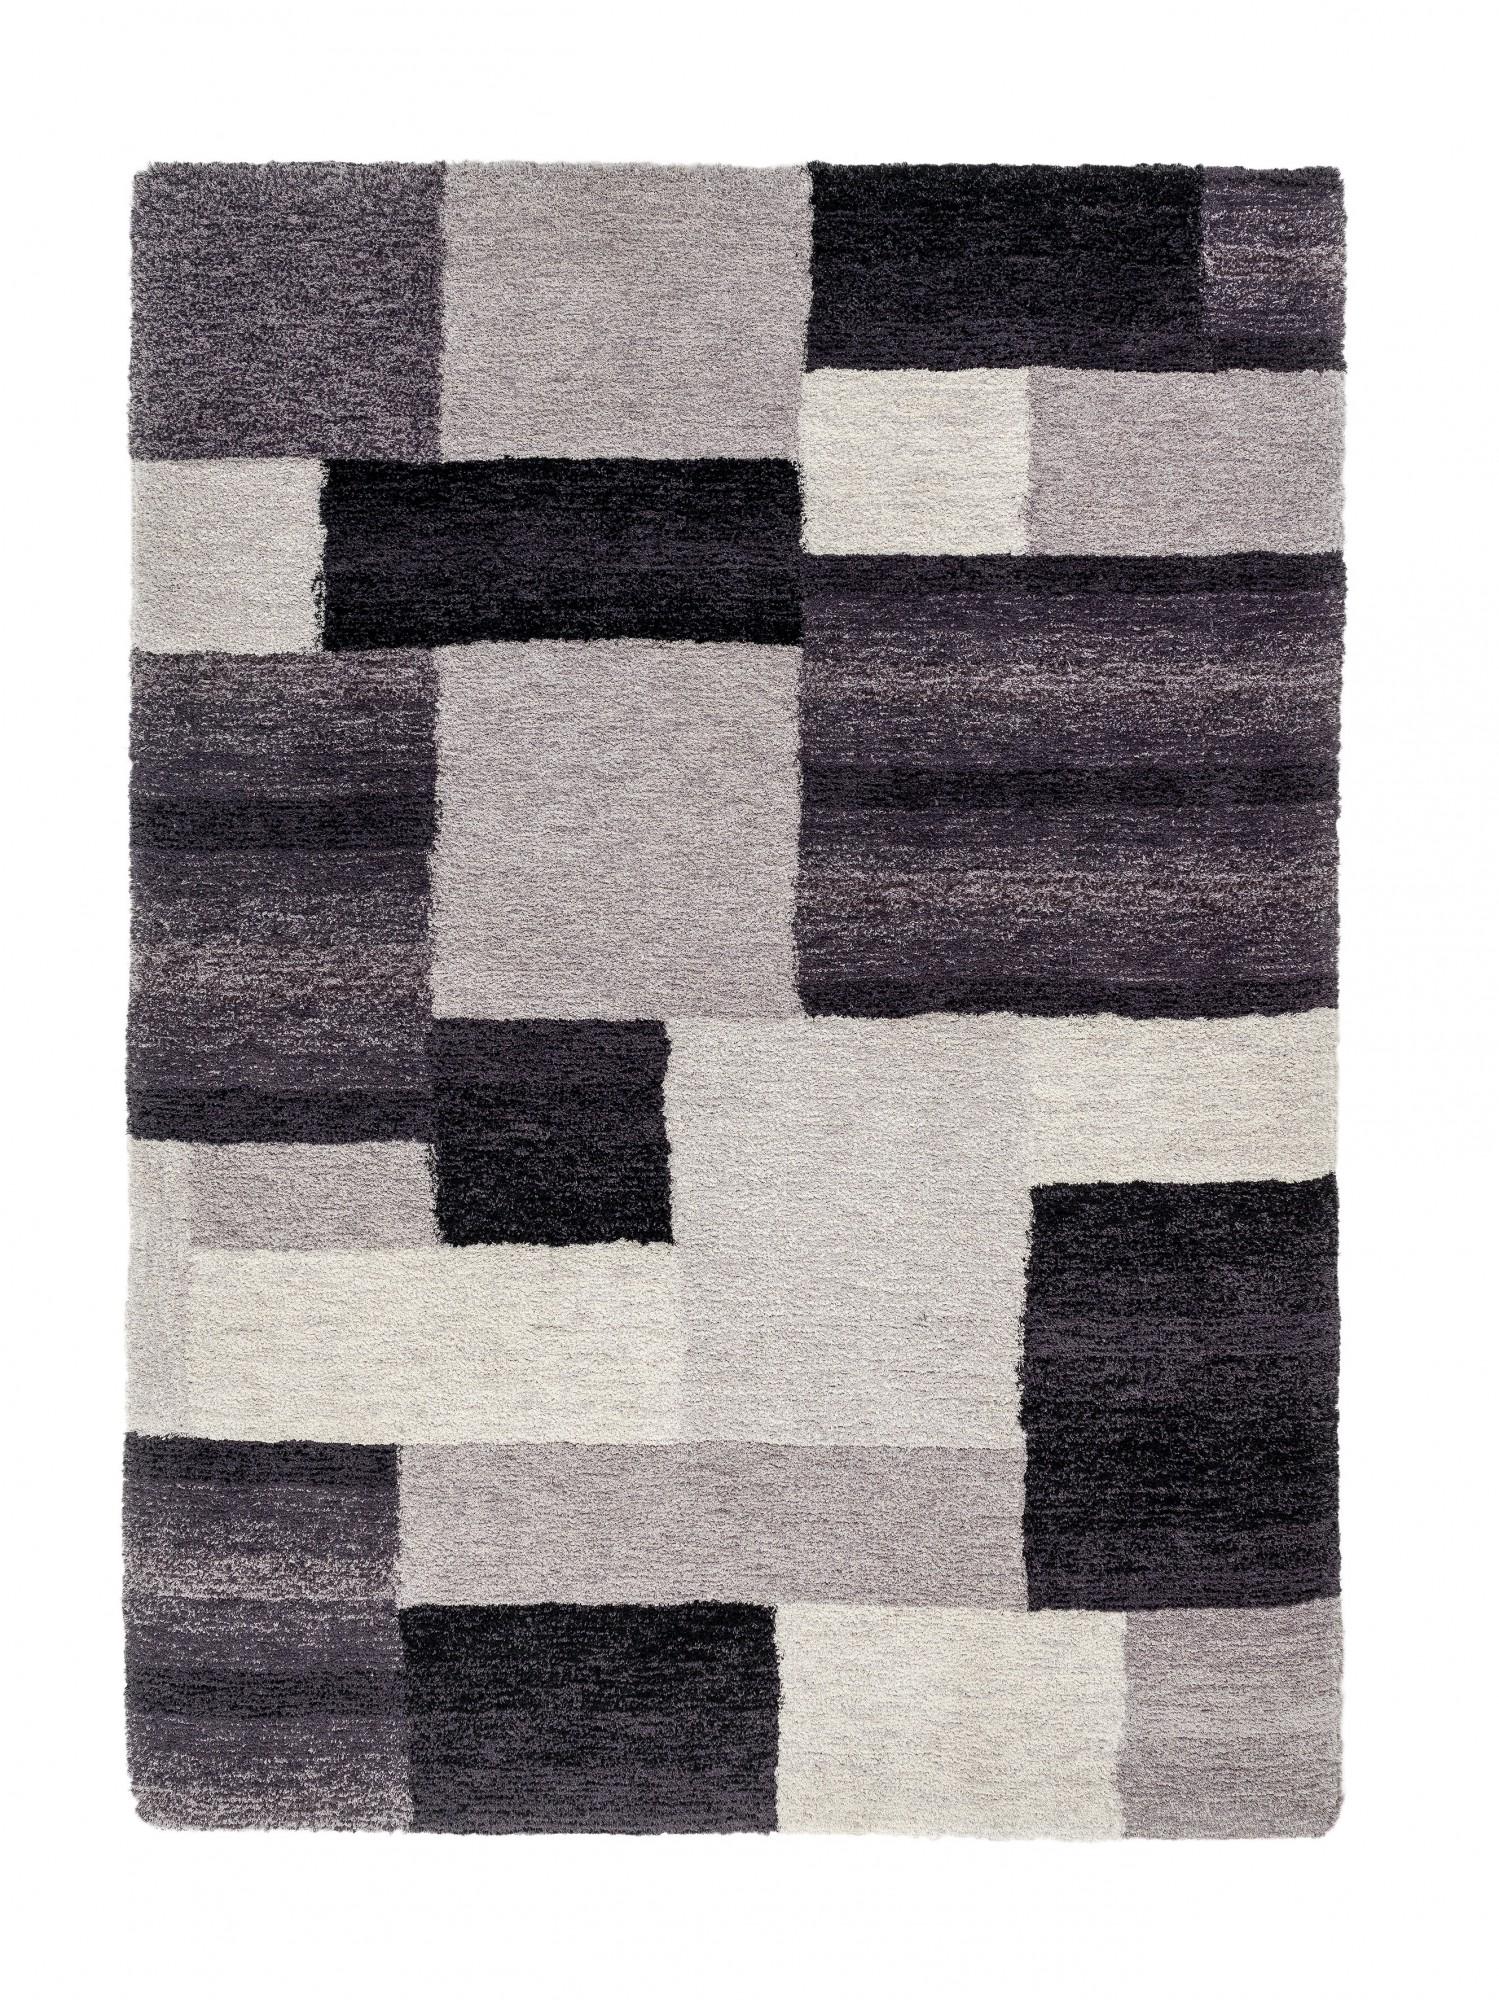 teppich hochflor shaggy flokati webteppich langflor kariert schwarz ebay. Black Bedroom Furniture Sets. Home Design Ideas